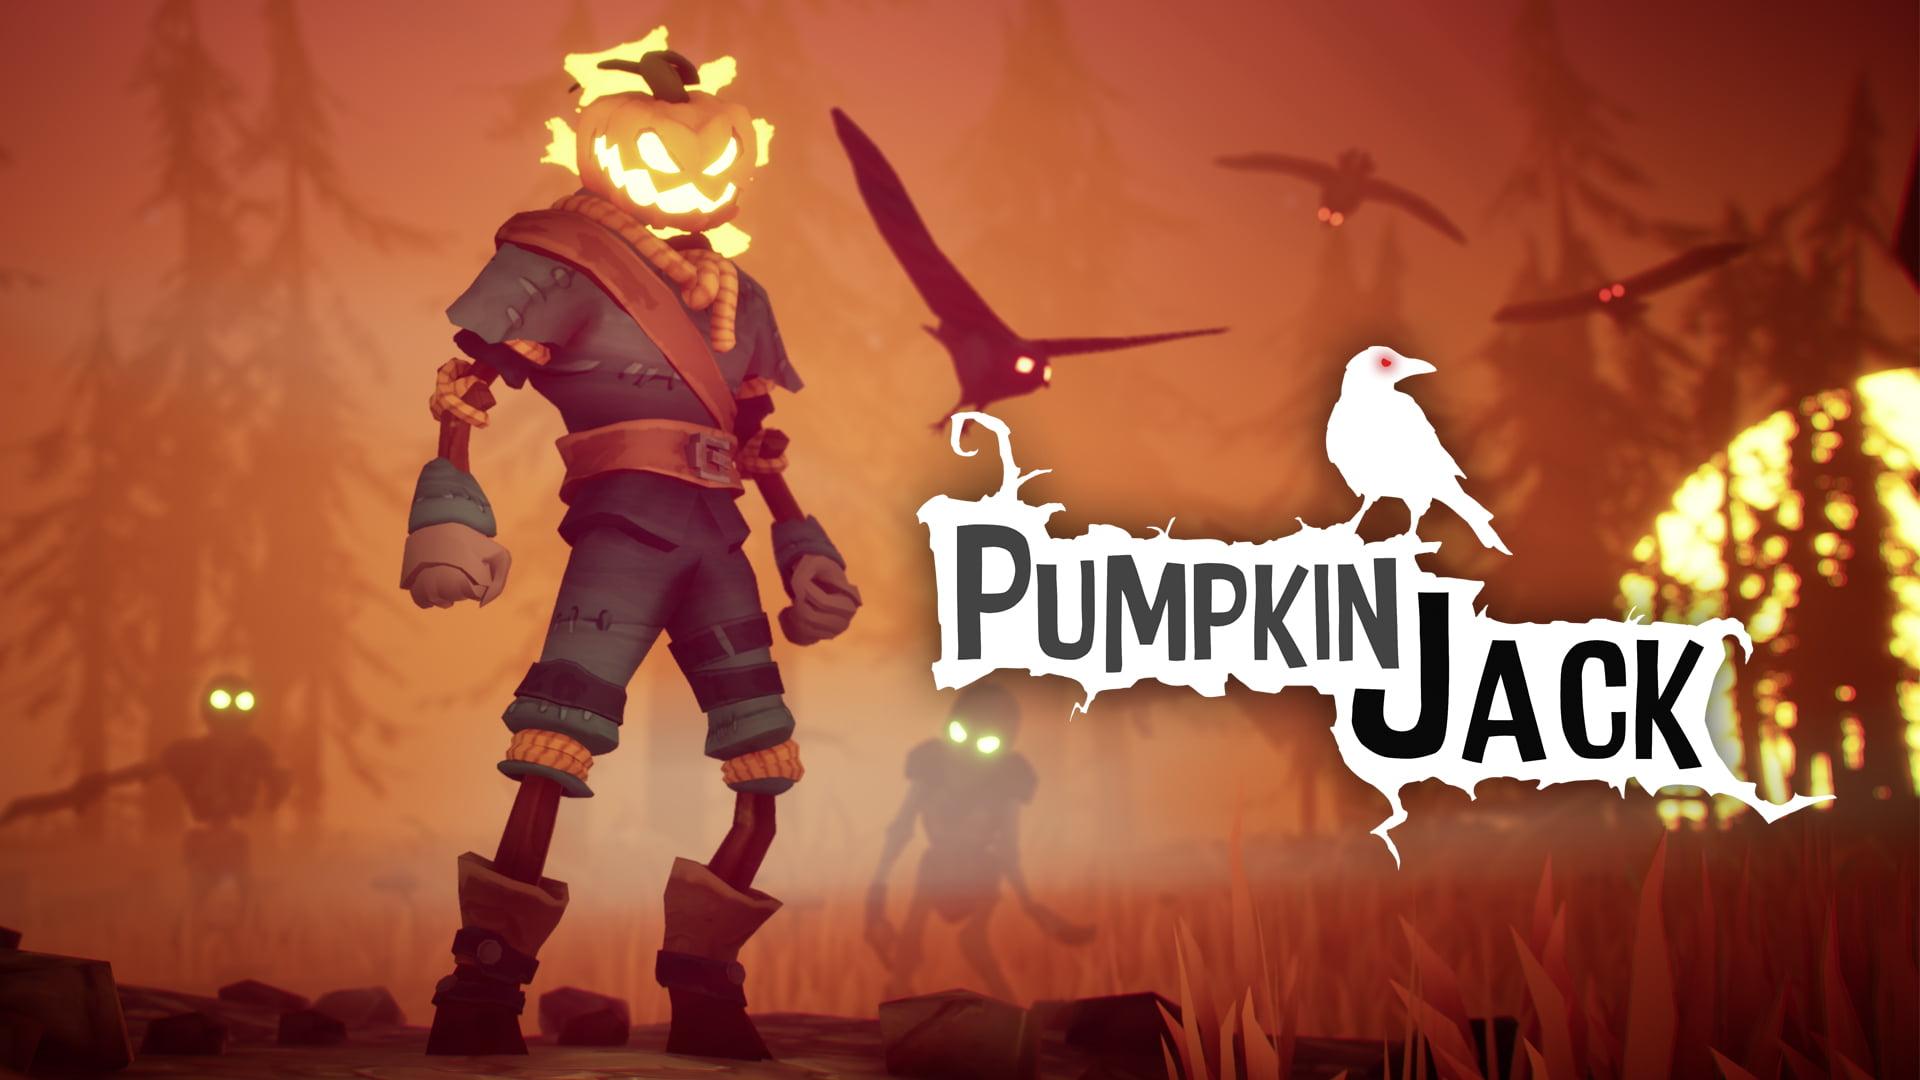 نقد و بررسی بازی Pumpkin Jack؛ کدوی سحرآمیز